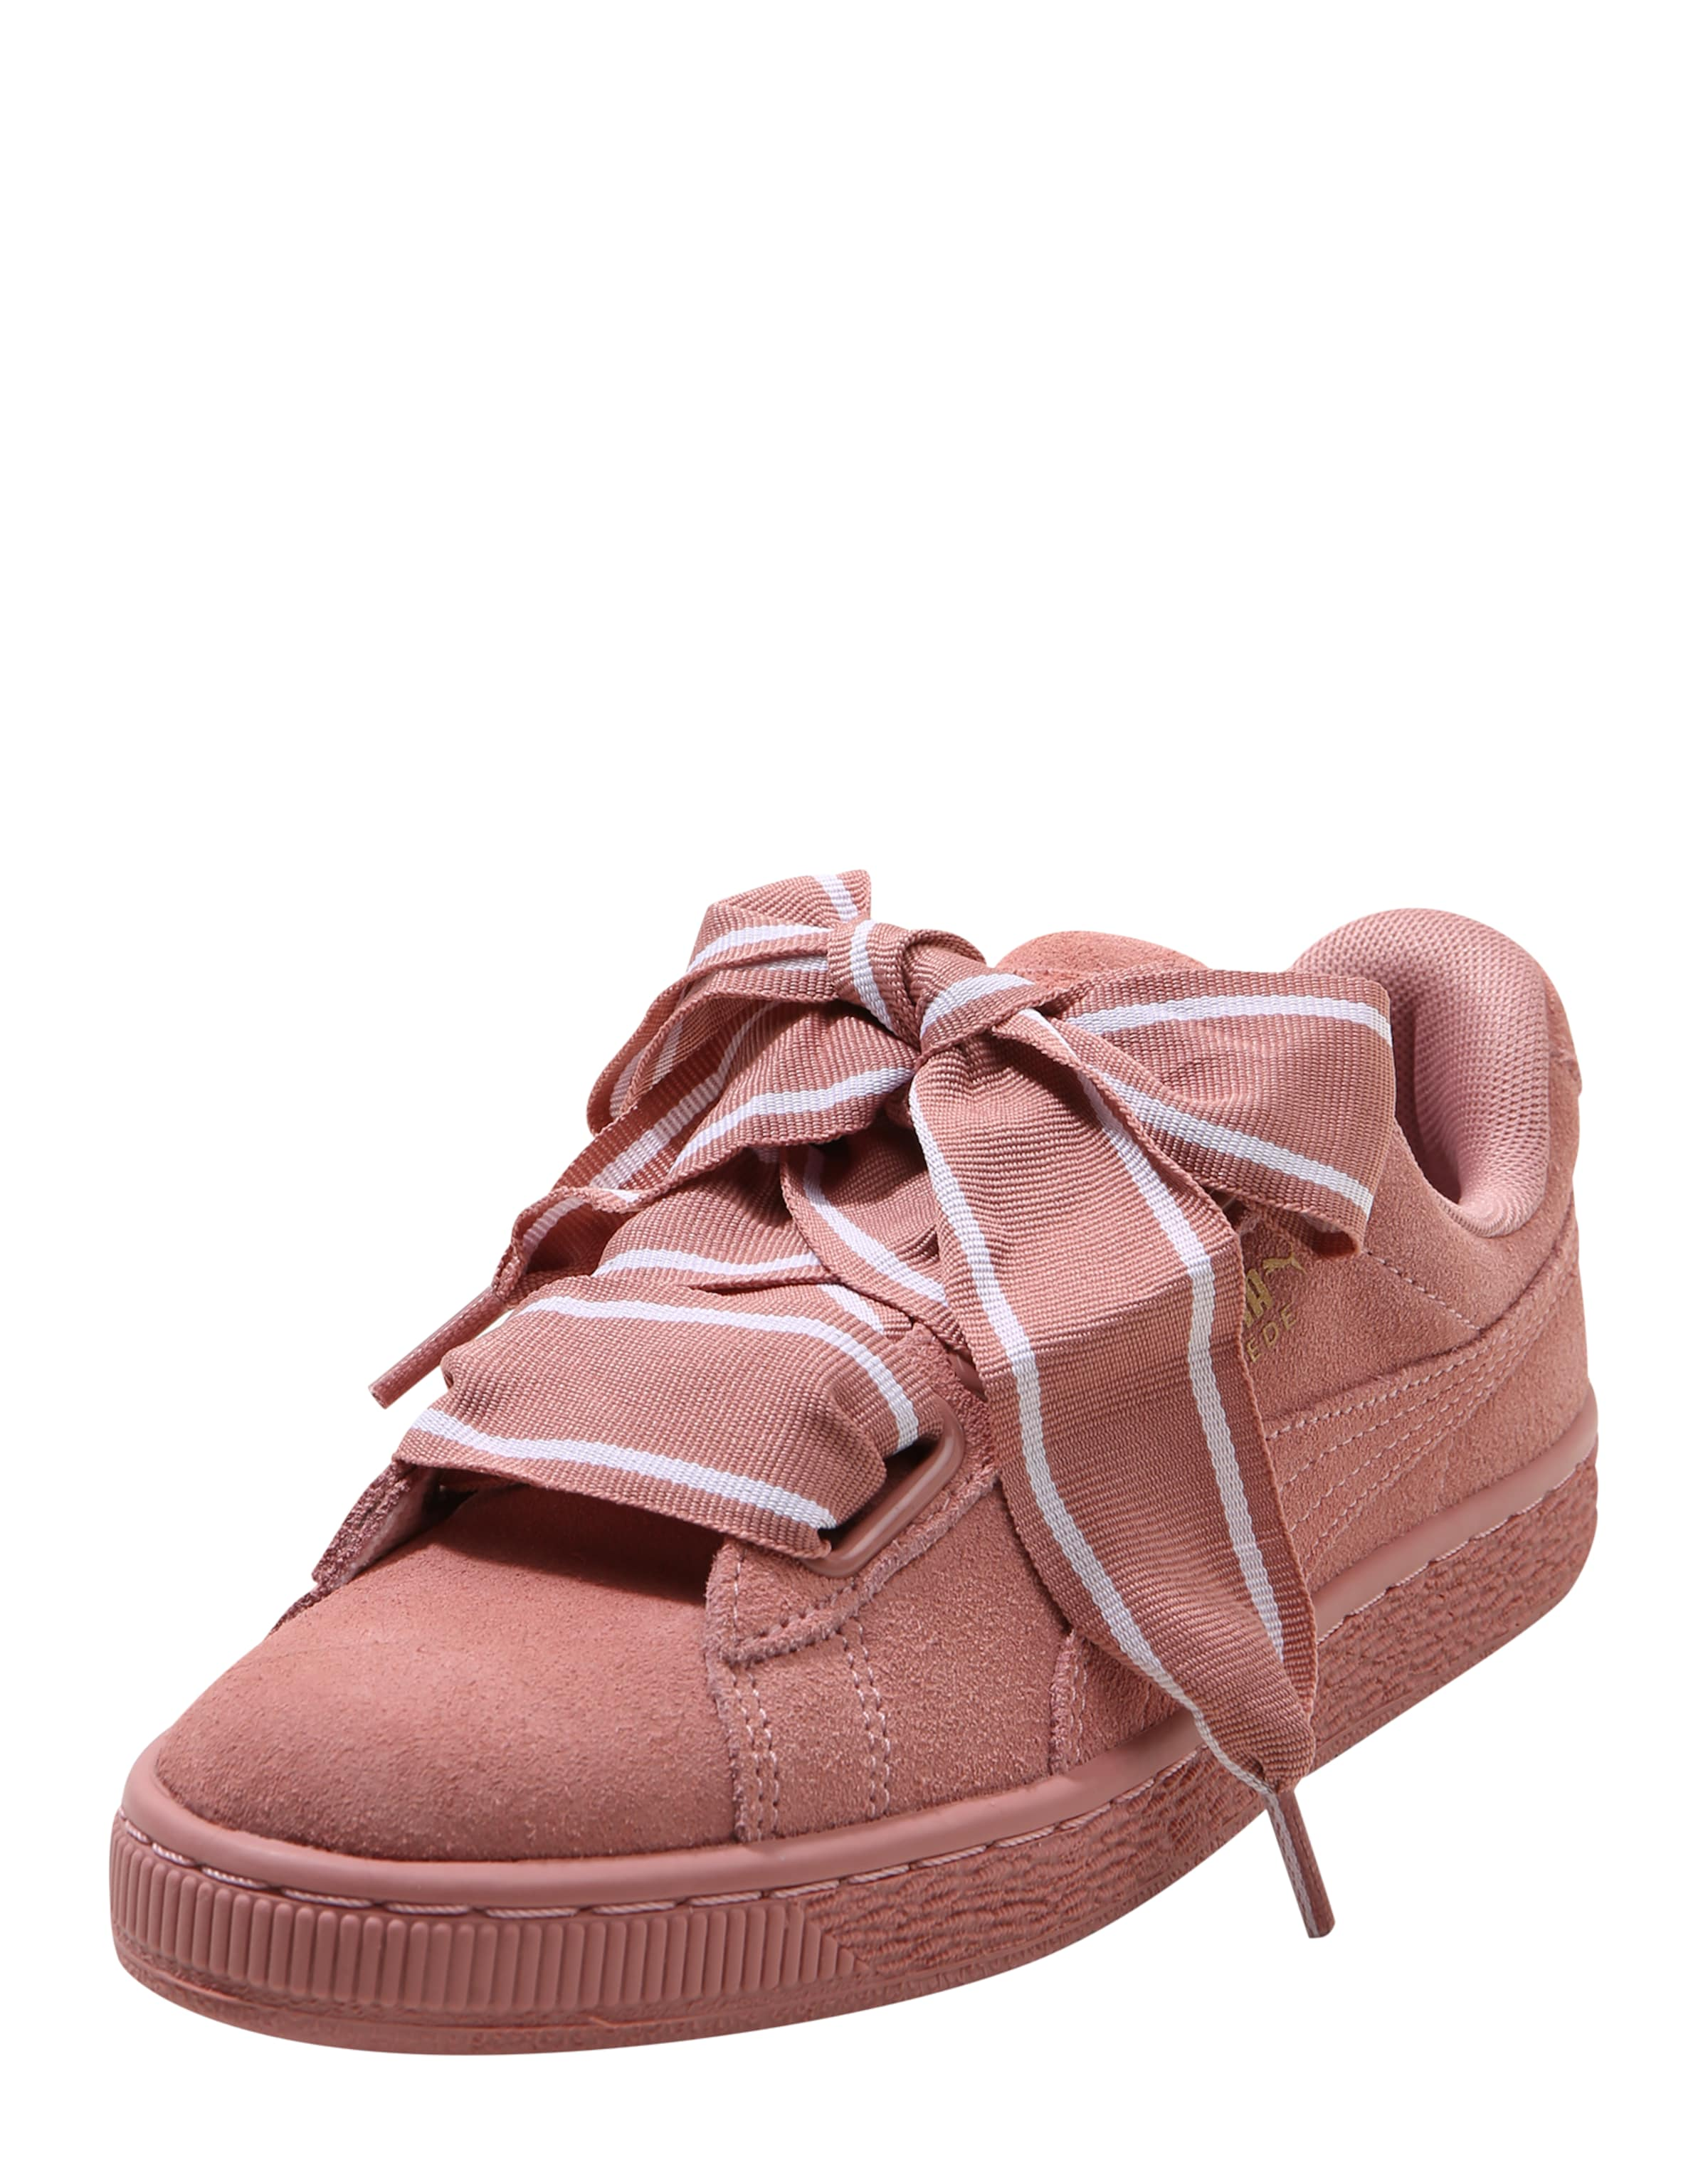 PUMA Sneaker Low 'Heart Satin II' Freies Verschiffen Online uBB7h